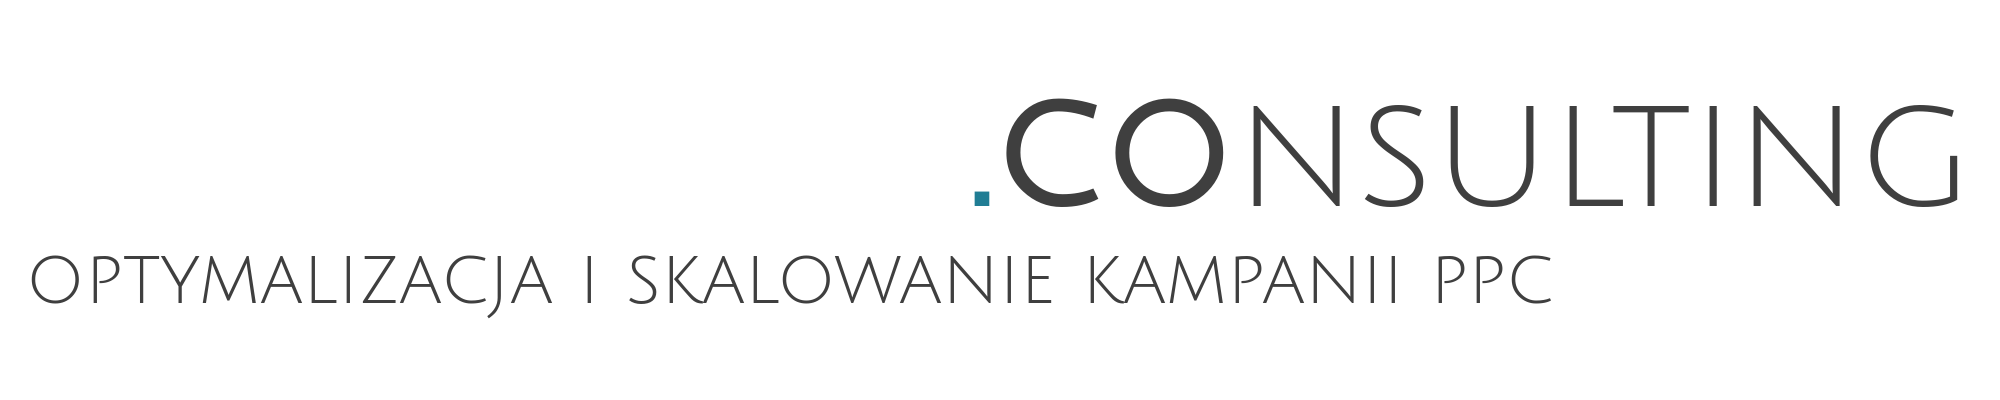 czajkowski.consulting logo